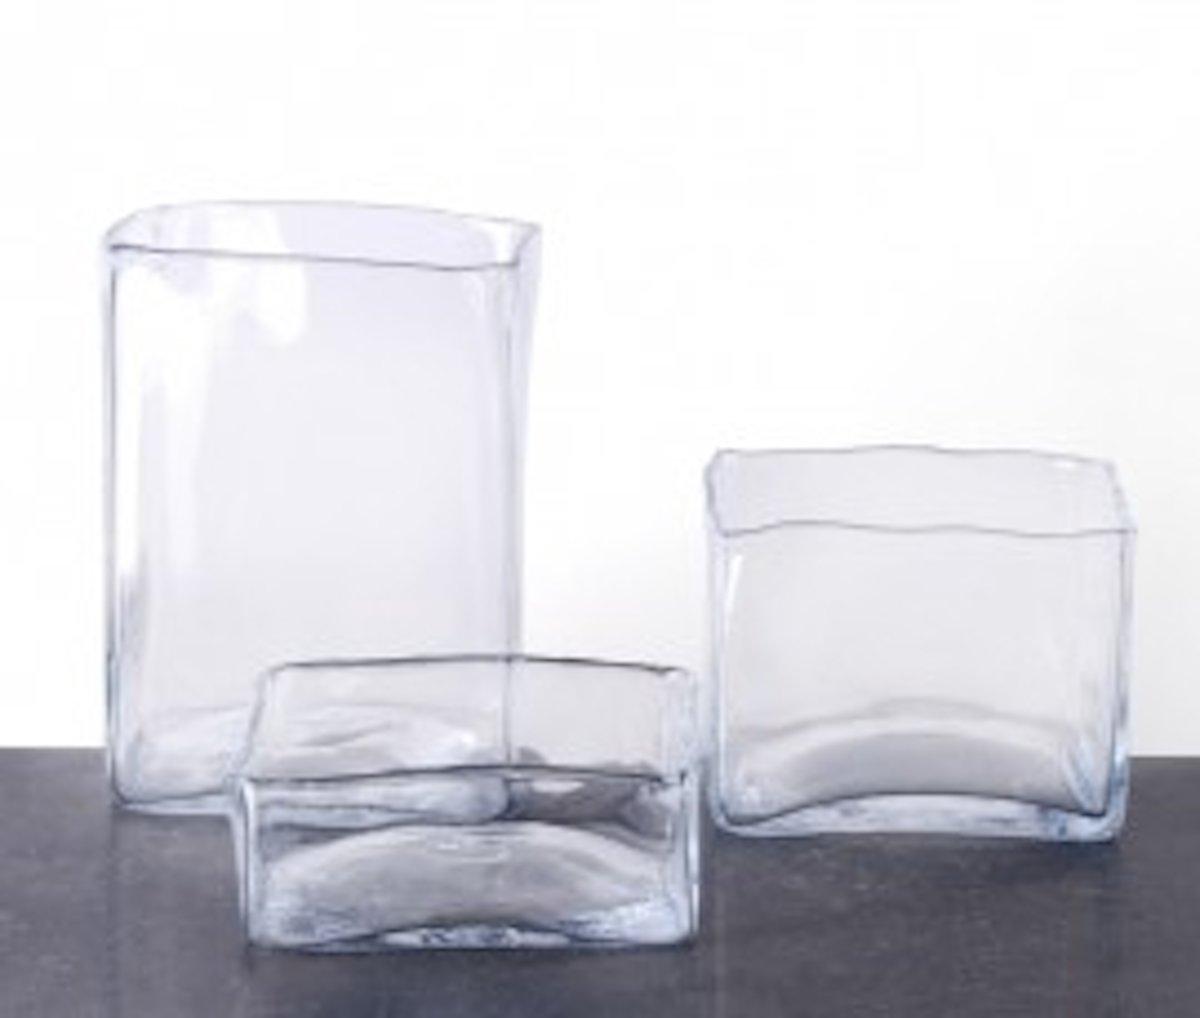 Maison Péderrey – Accubak – Schaal – Glas – Glaswerk – Mondgeblazen glas